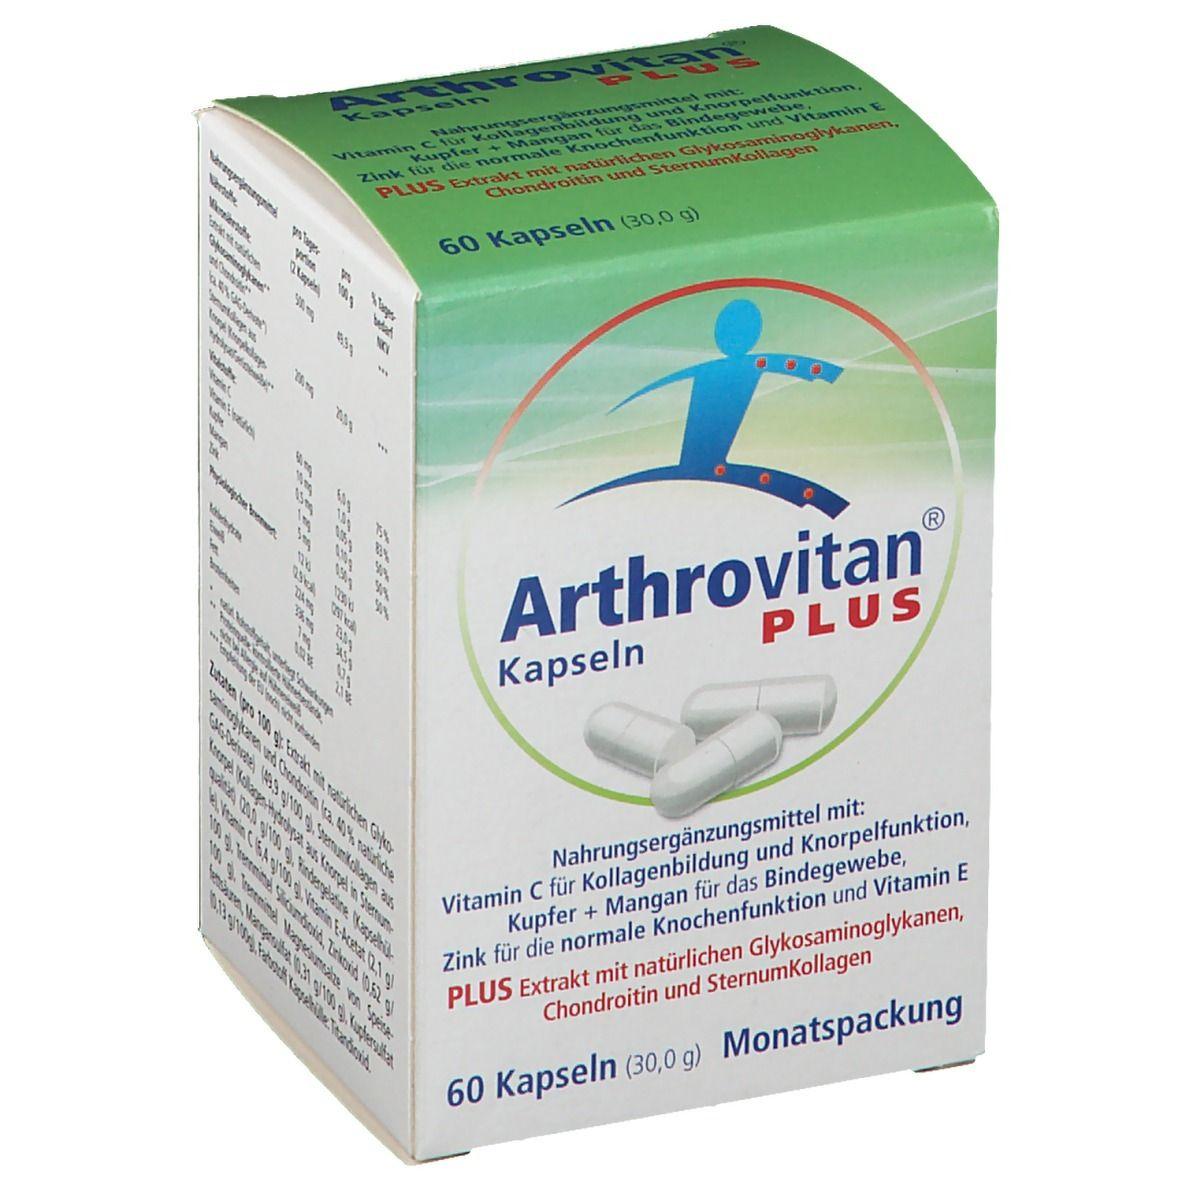 Image of Arthrovitan® PLUS Kapseln